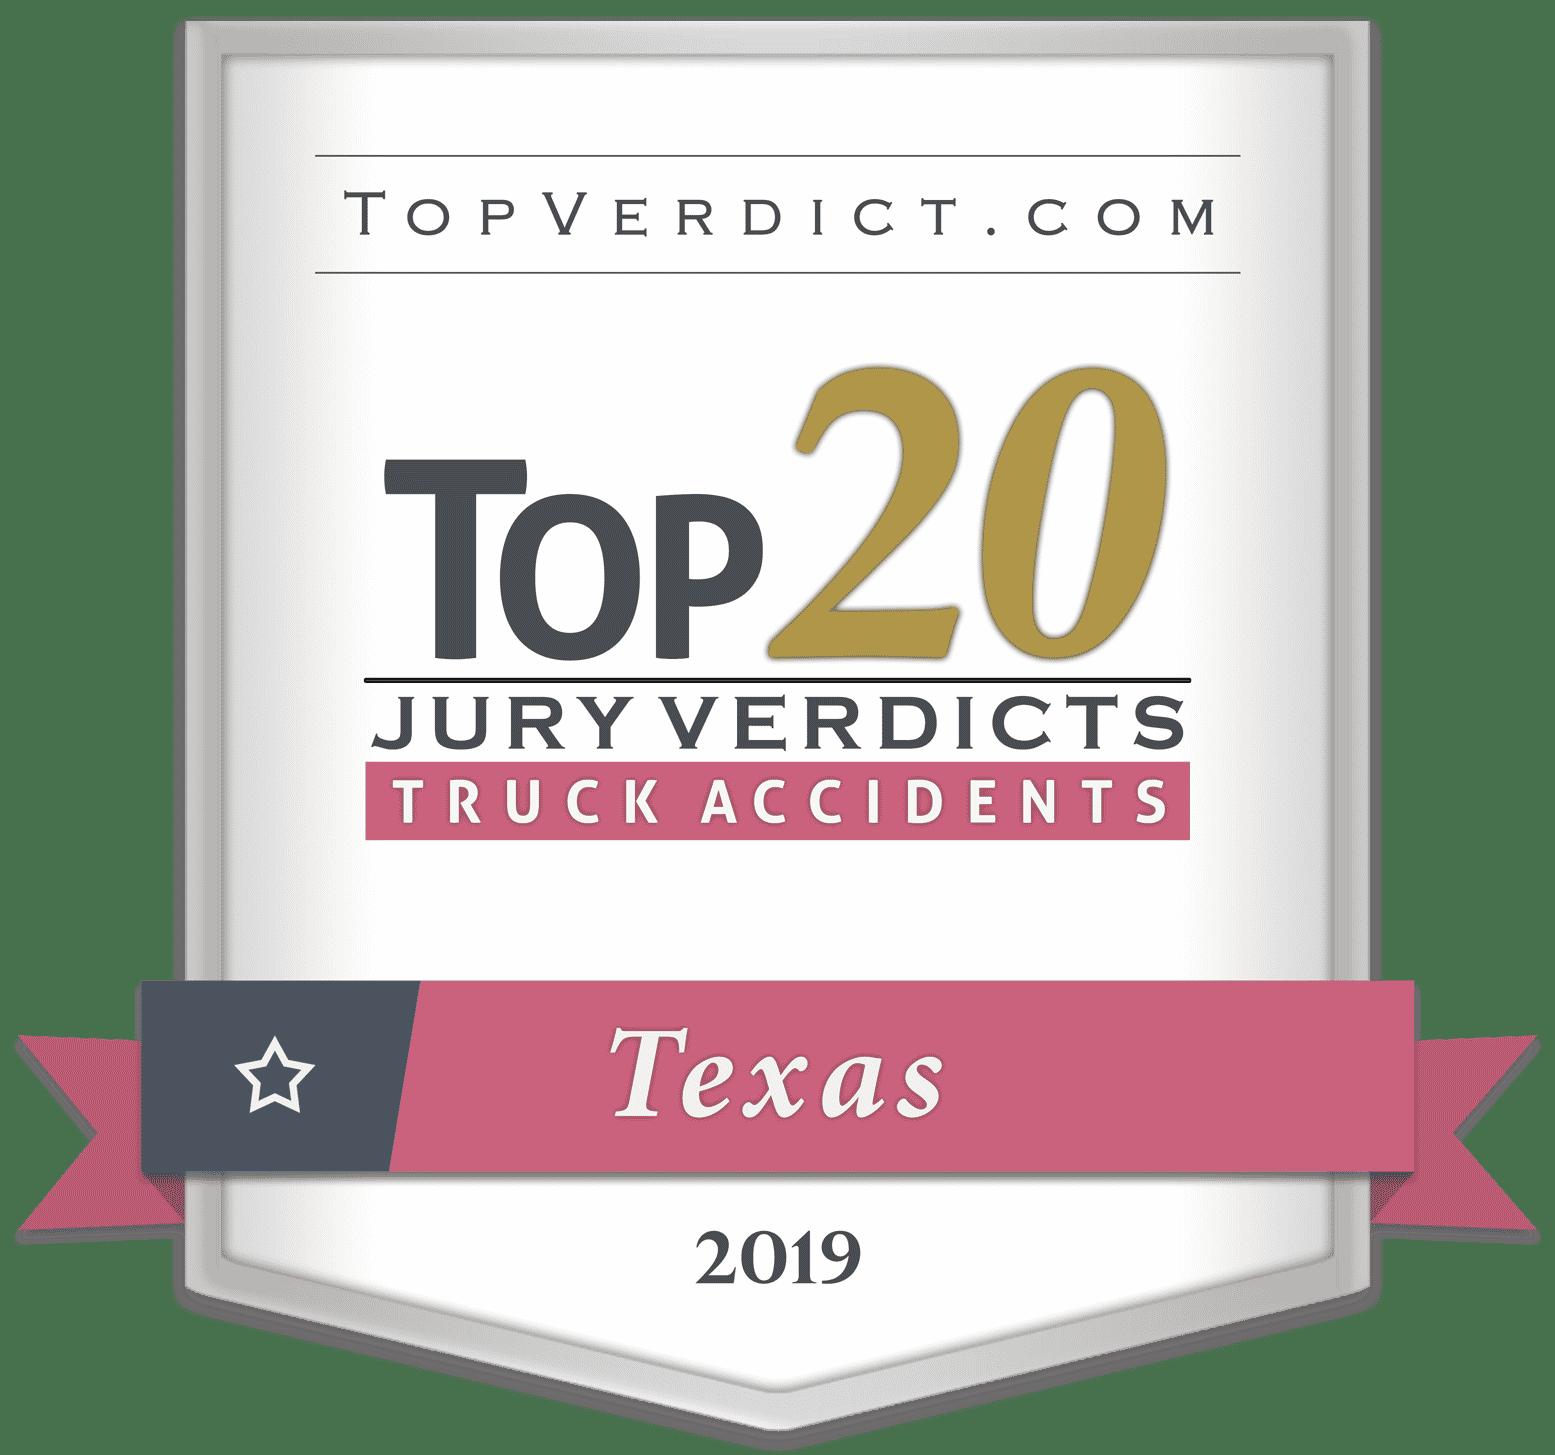 Top 20 Truck Accident Verdicts 2019